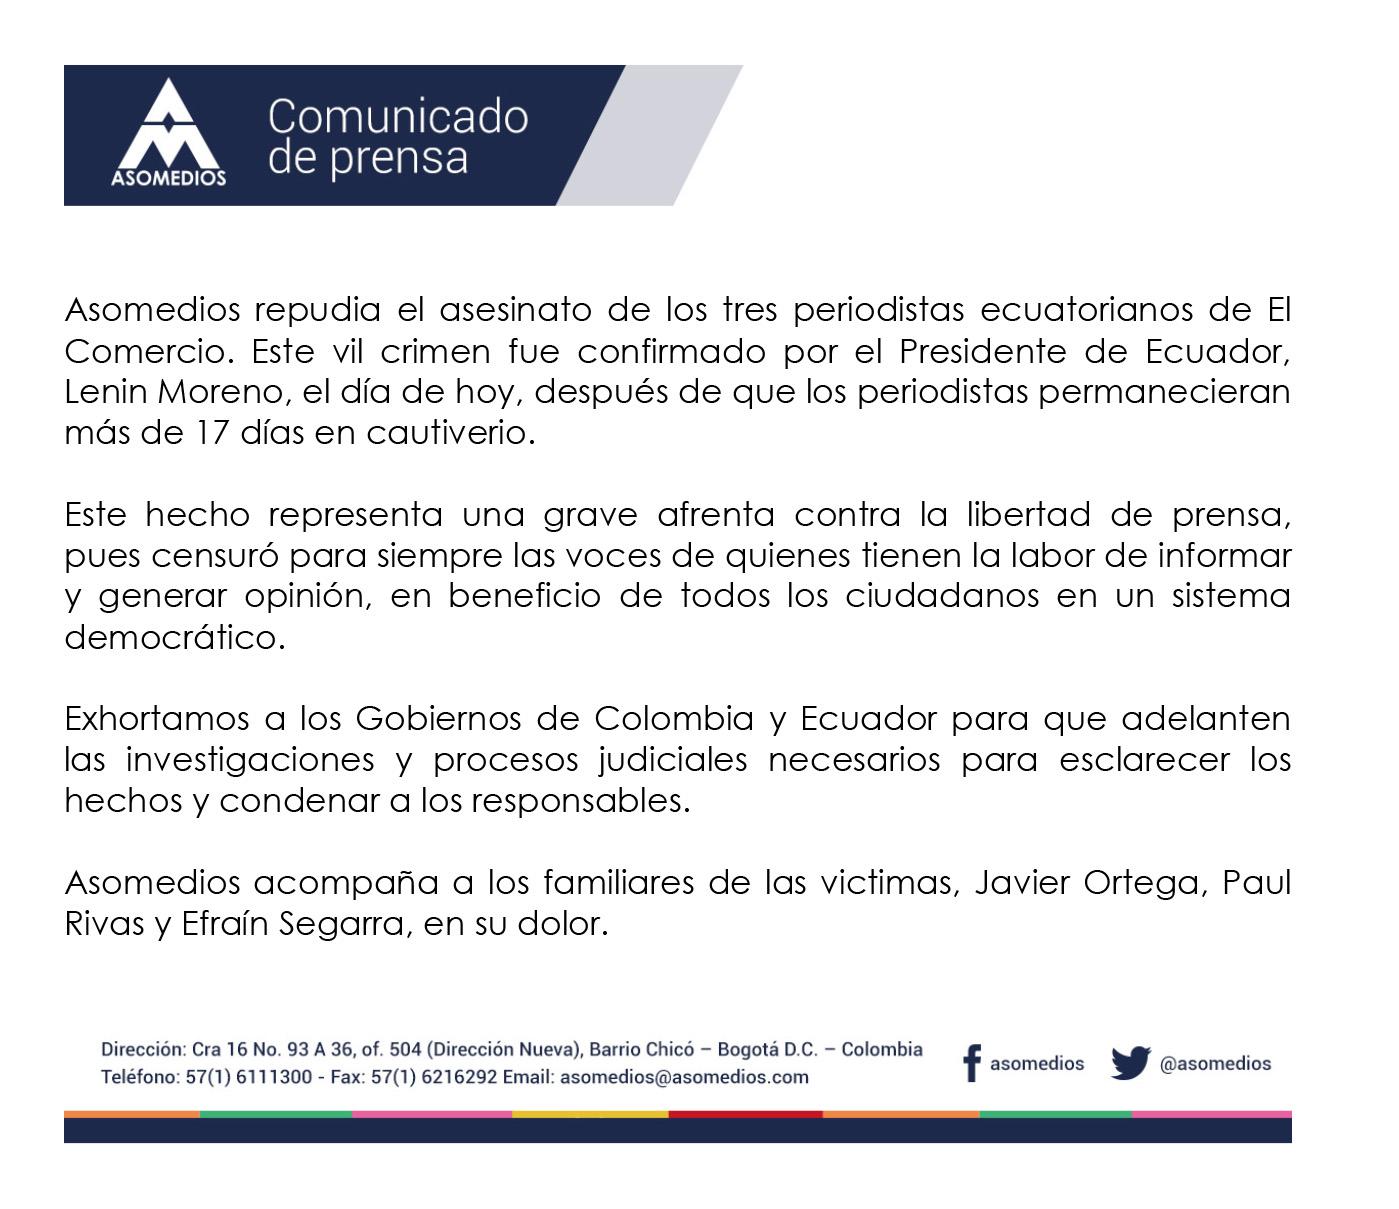 COMUNICADO DE PRENSA RESPECTO AL ASESINATO DE LOS 3 PERIODISTAS DE ECUADOR